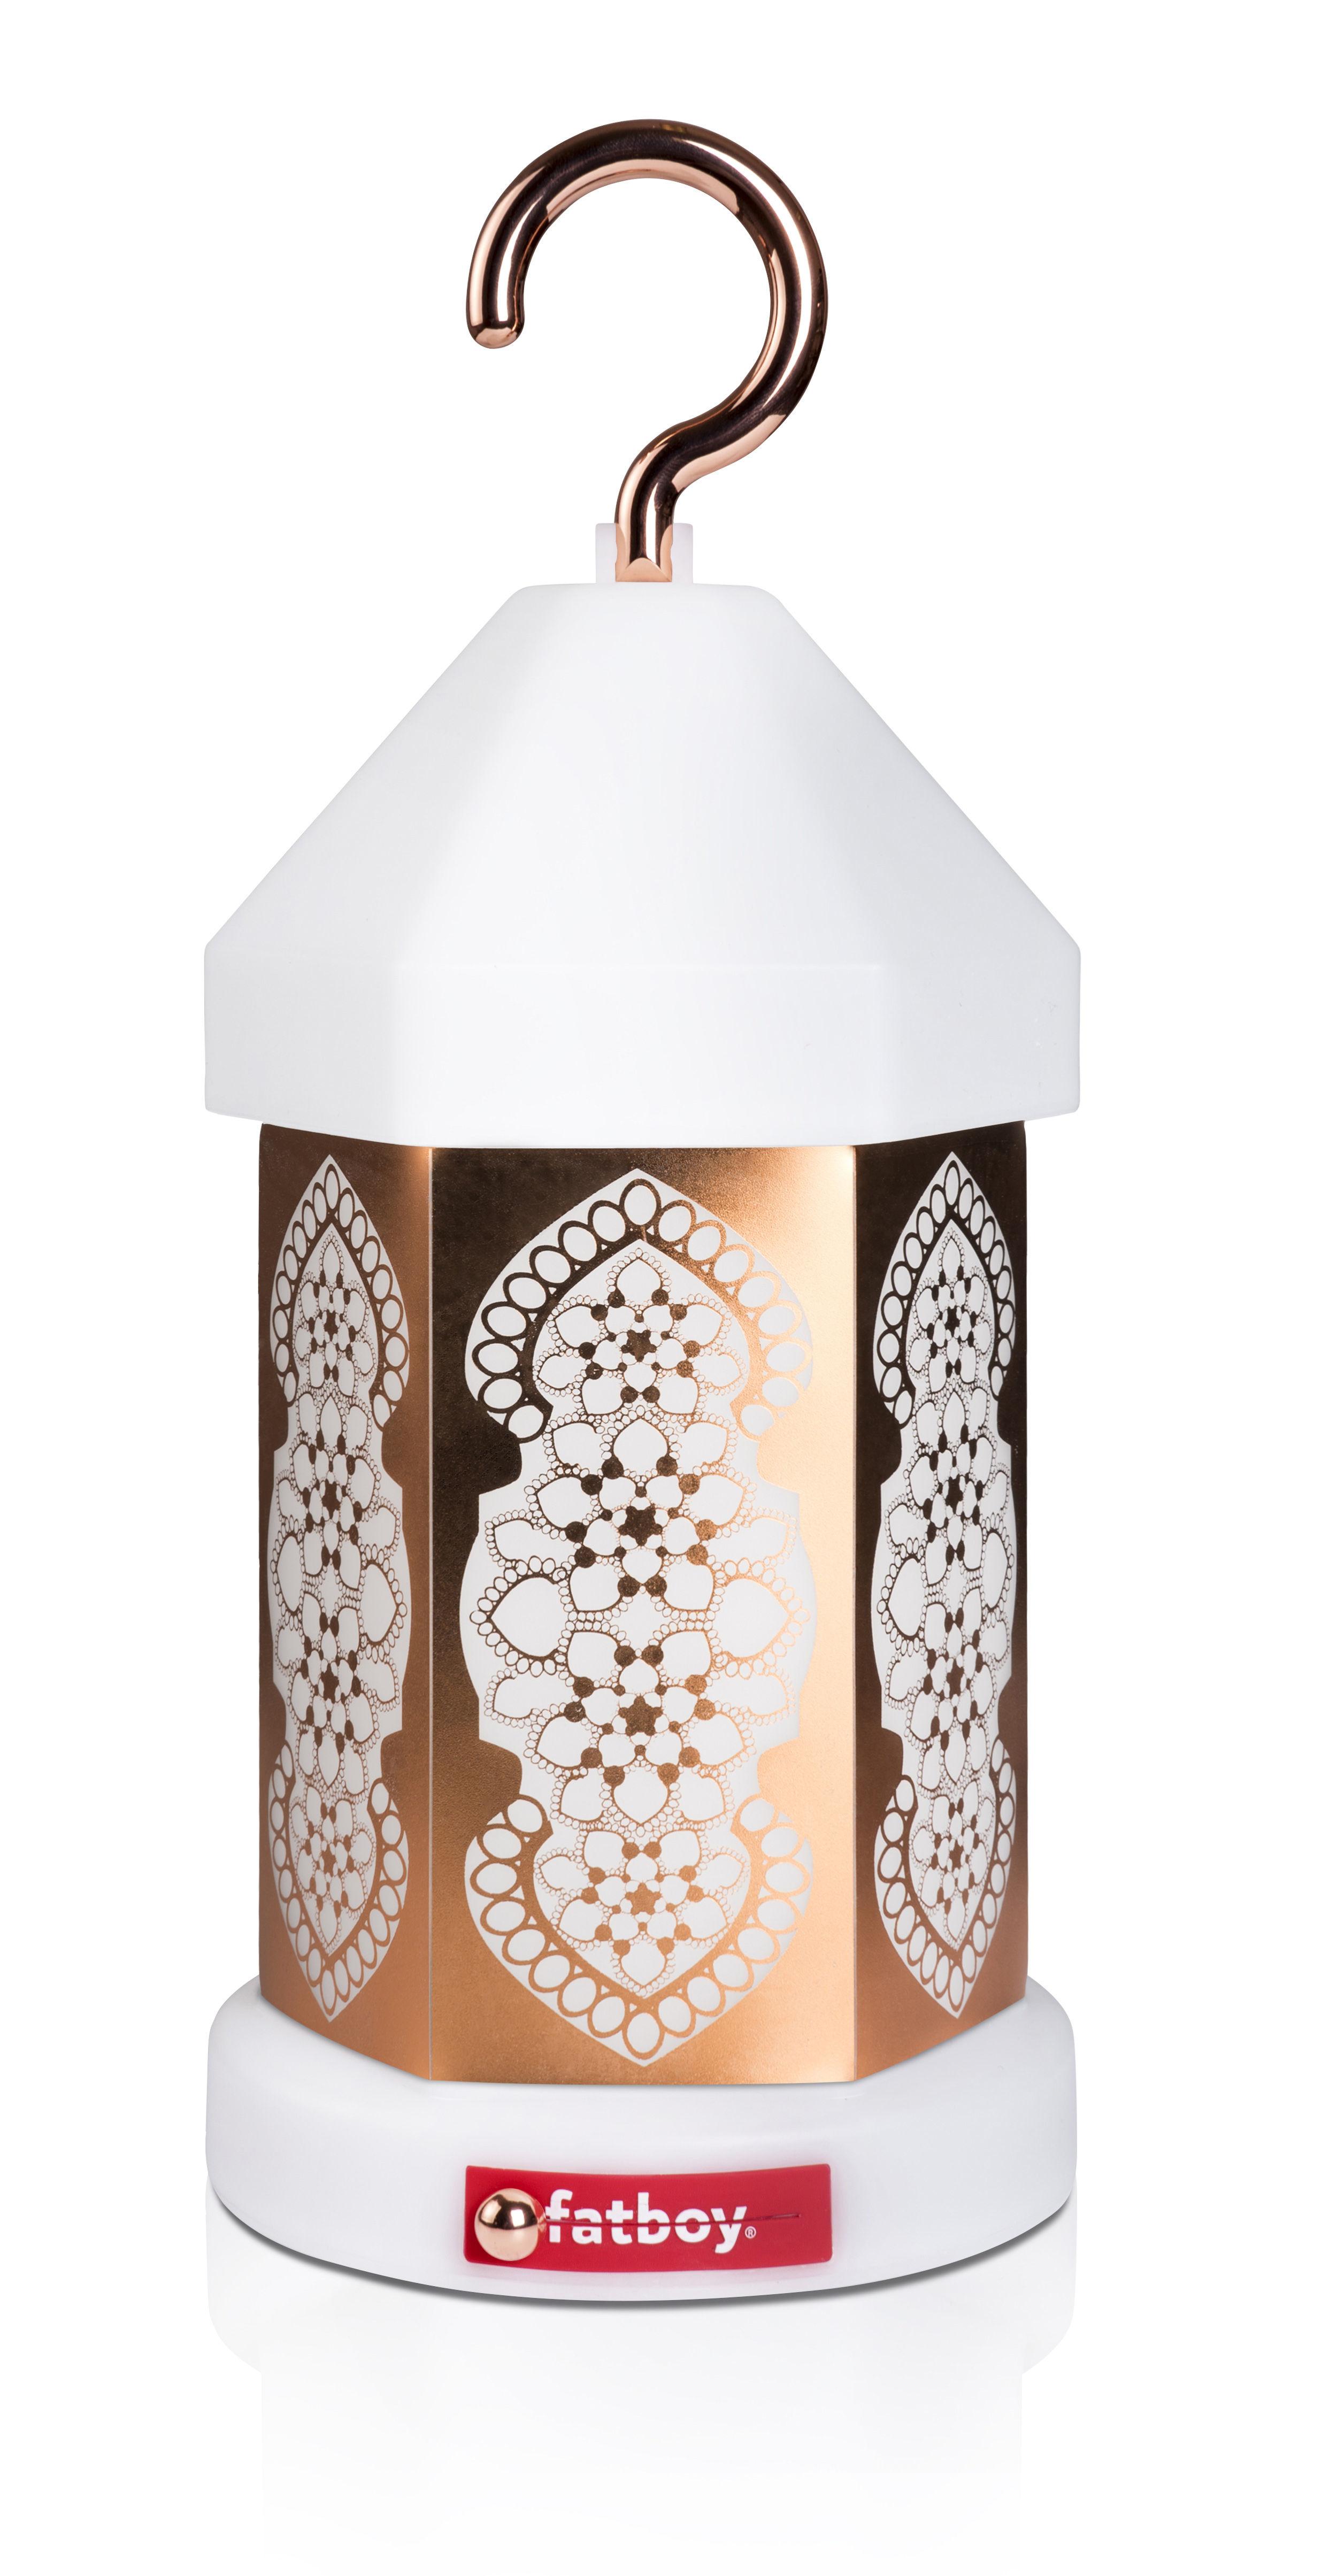 lampie on deluxe lampe ohne kabel mit usb ladekabel inkl 4 deko blenden wei haken. Black Bedroom Furniture Sets. Home Design Ideas